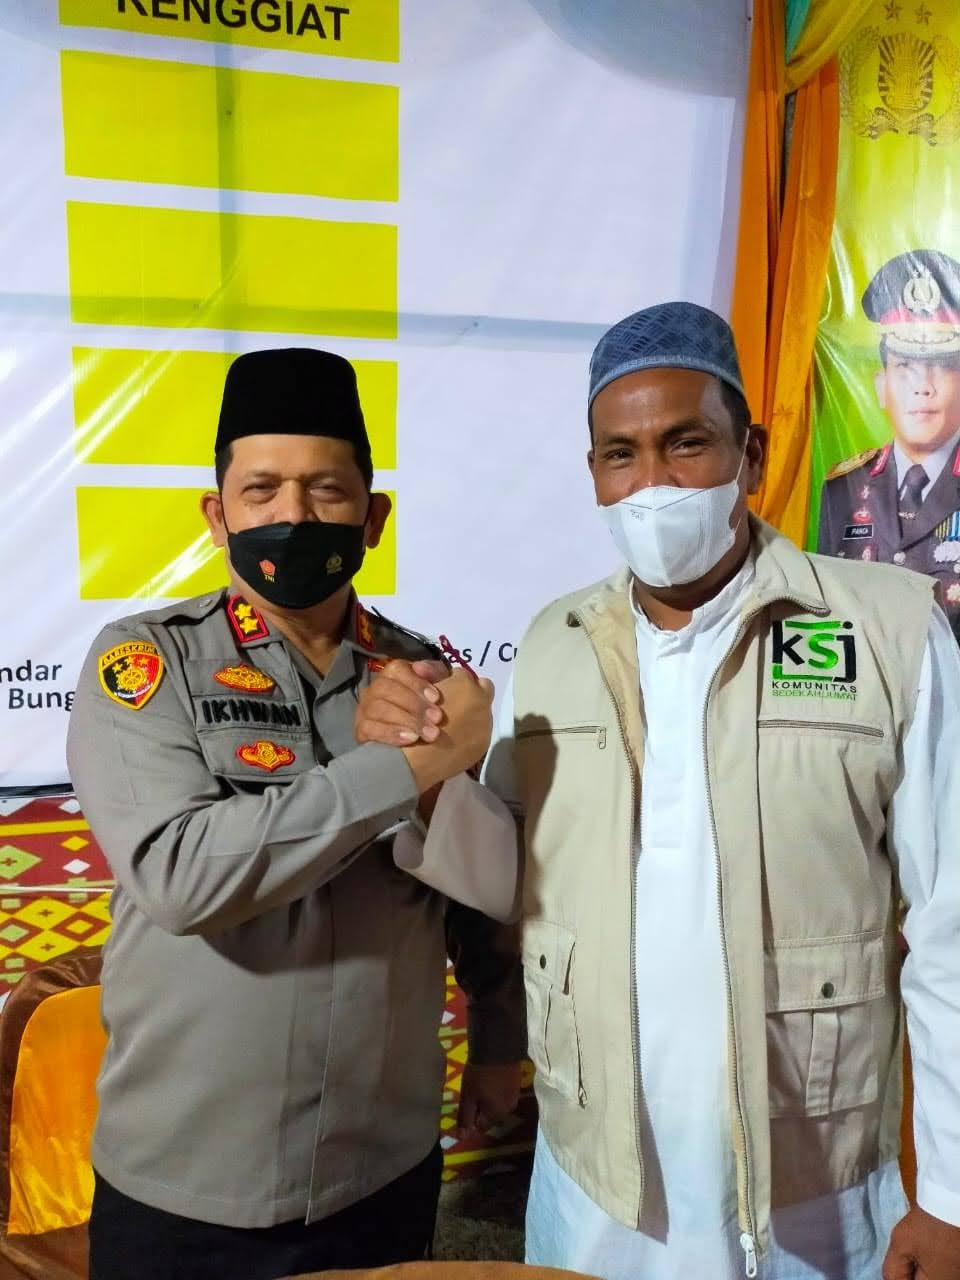 Dukungan Penuh Untuk Ksj Para Imam Masjid Di Seluruh Kecamatan Tanjung Tiram Memakai Rompi Ksj